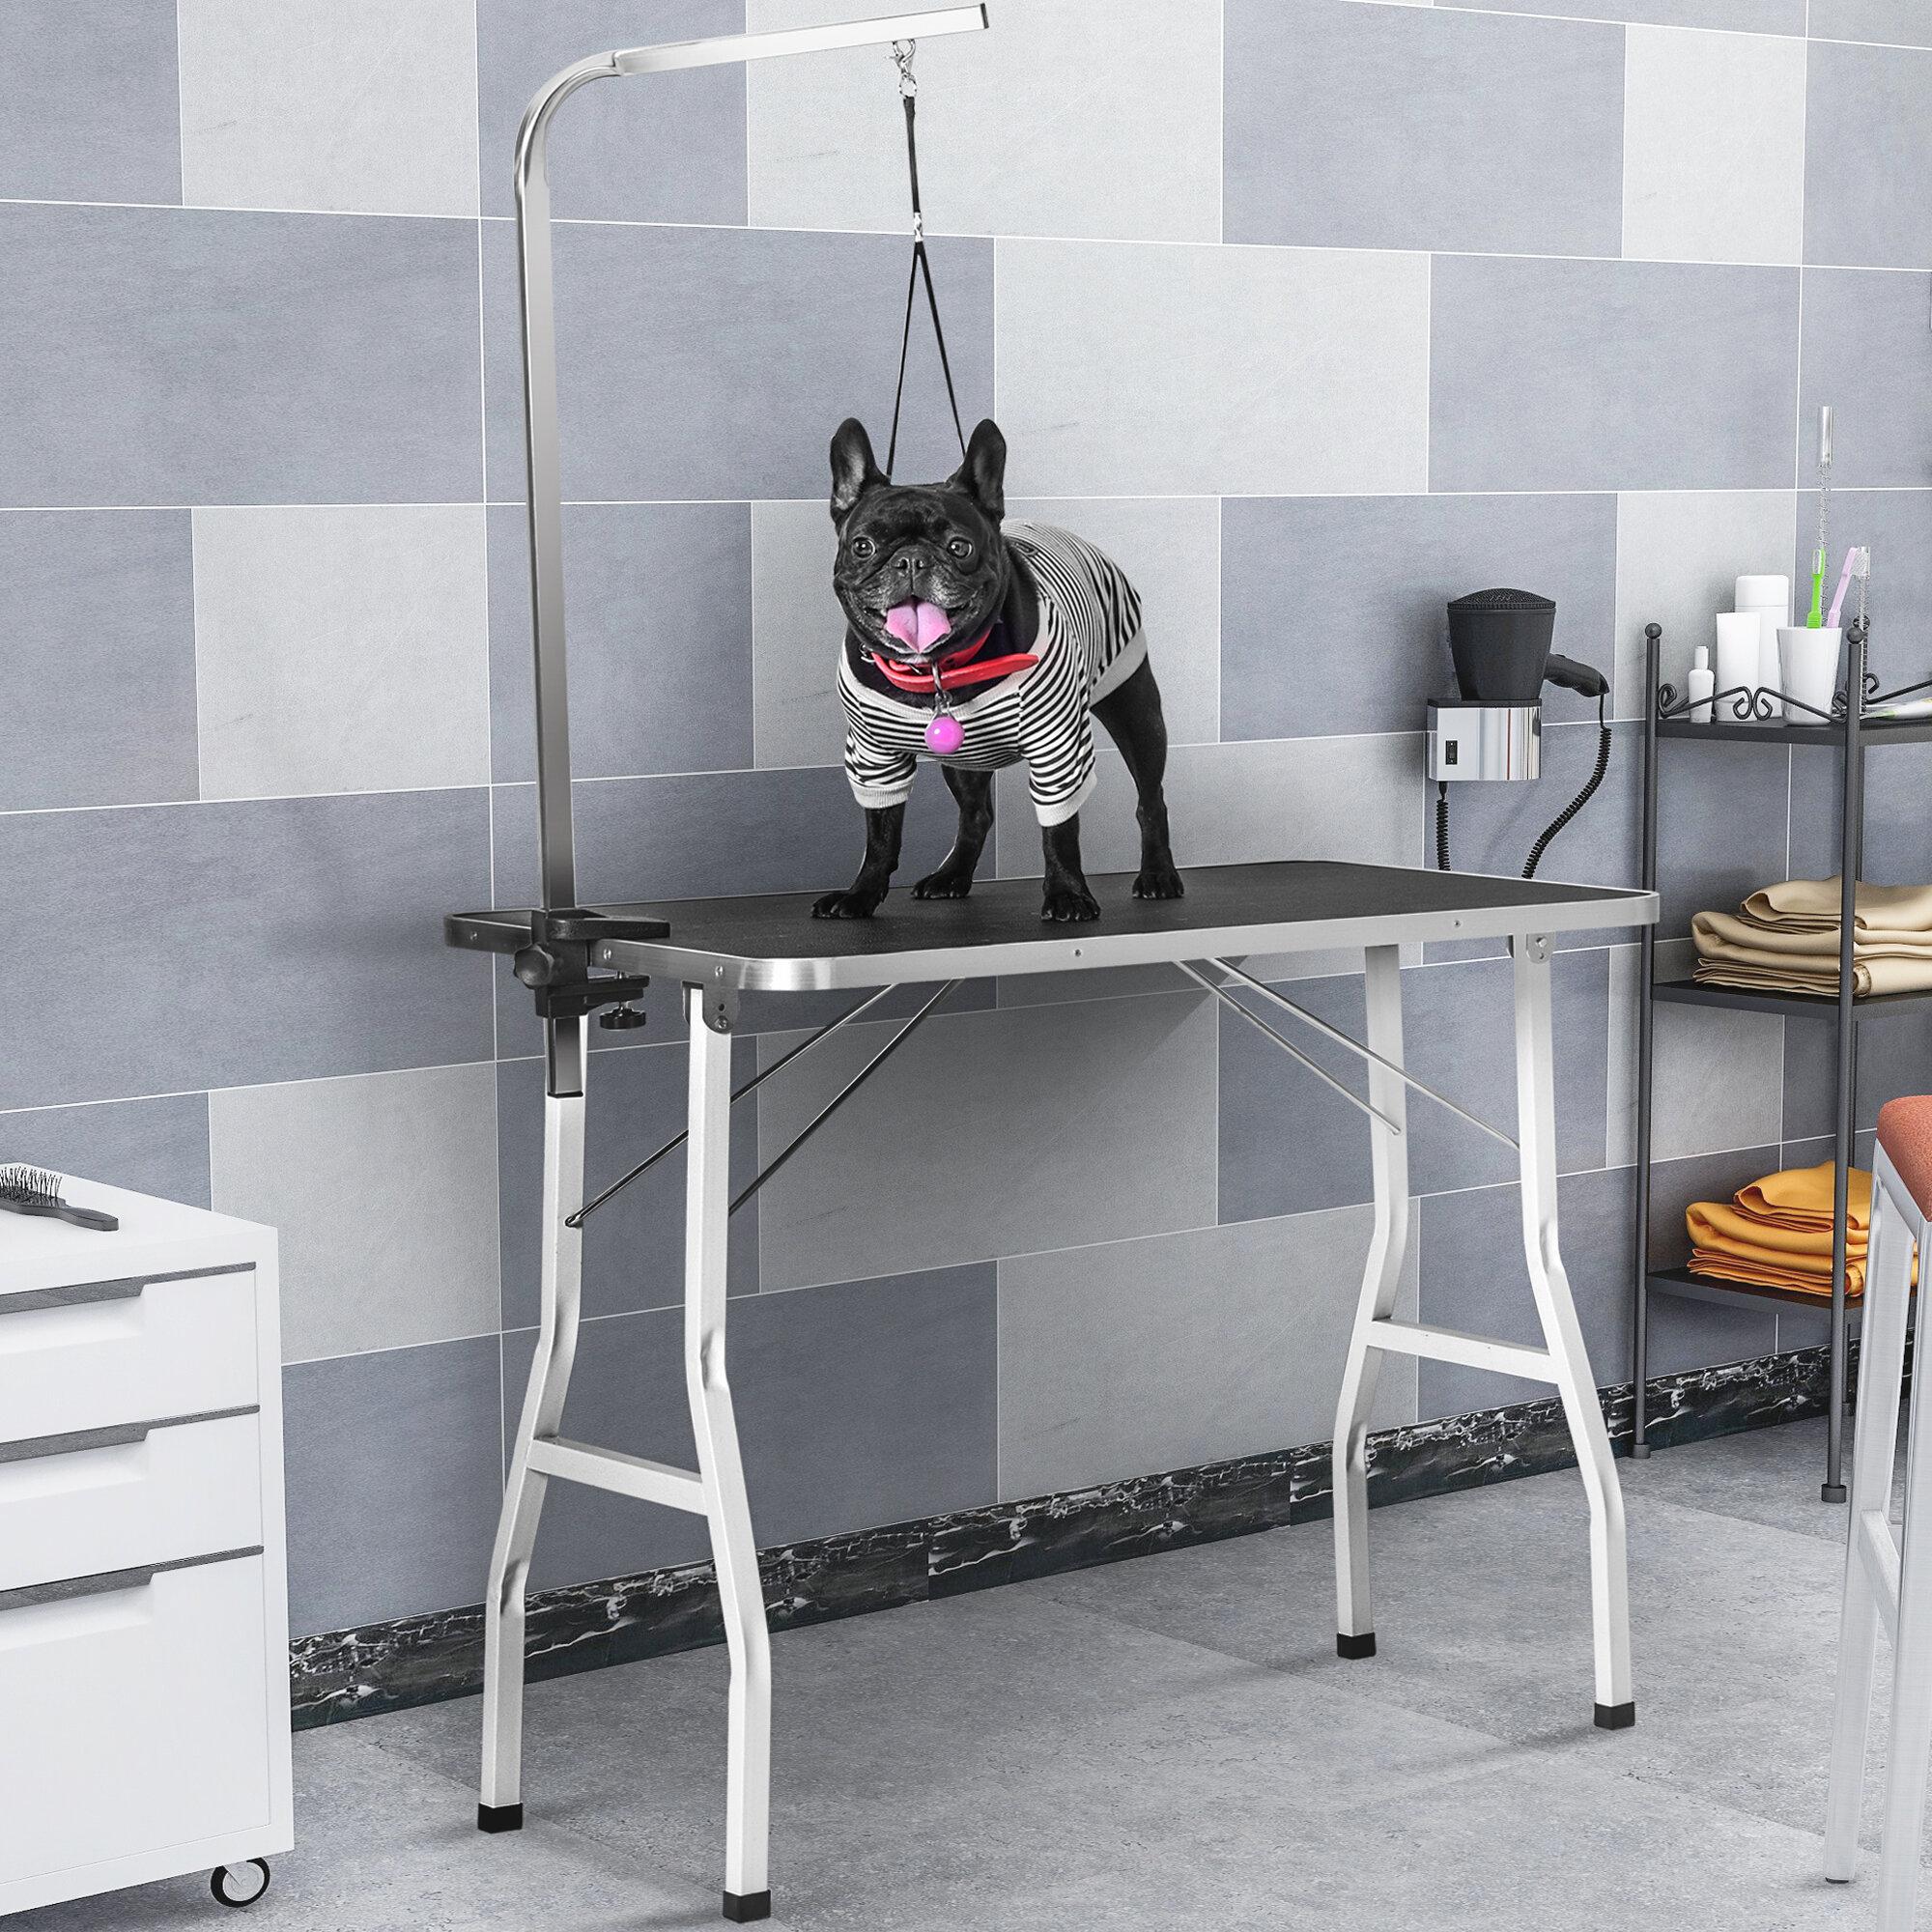 H J Wedoo Nylon Rubber Mat Pet Grooming Table Wayfair